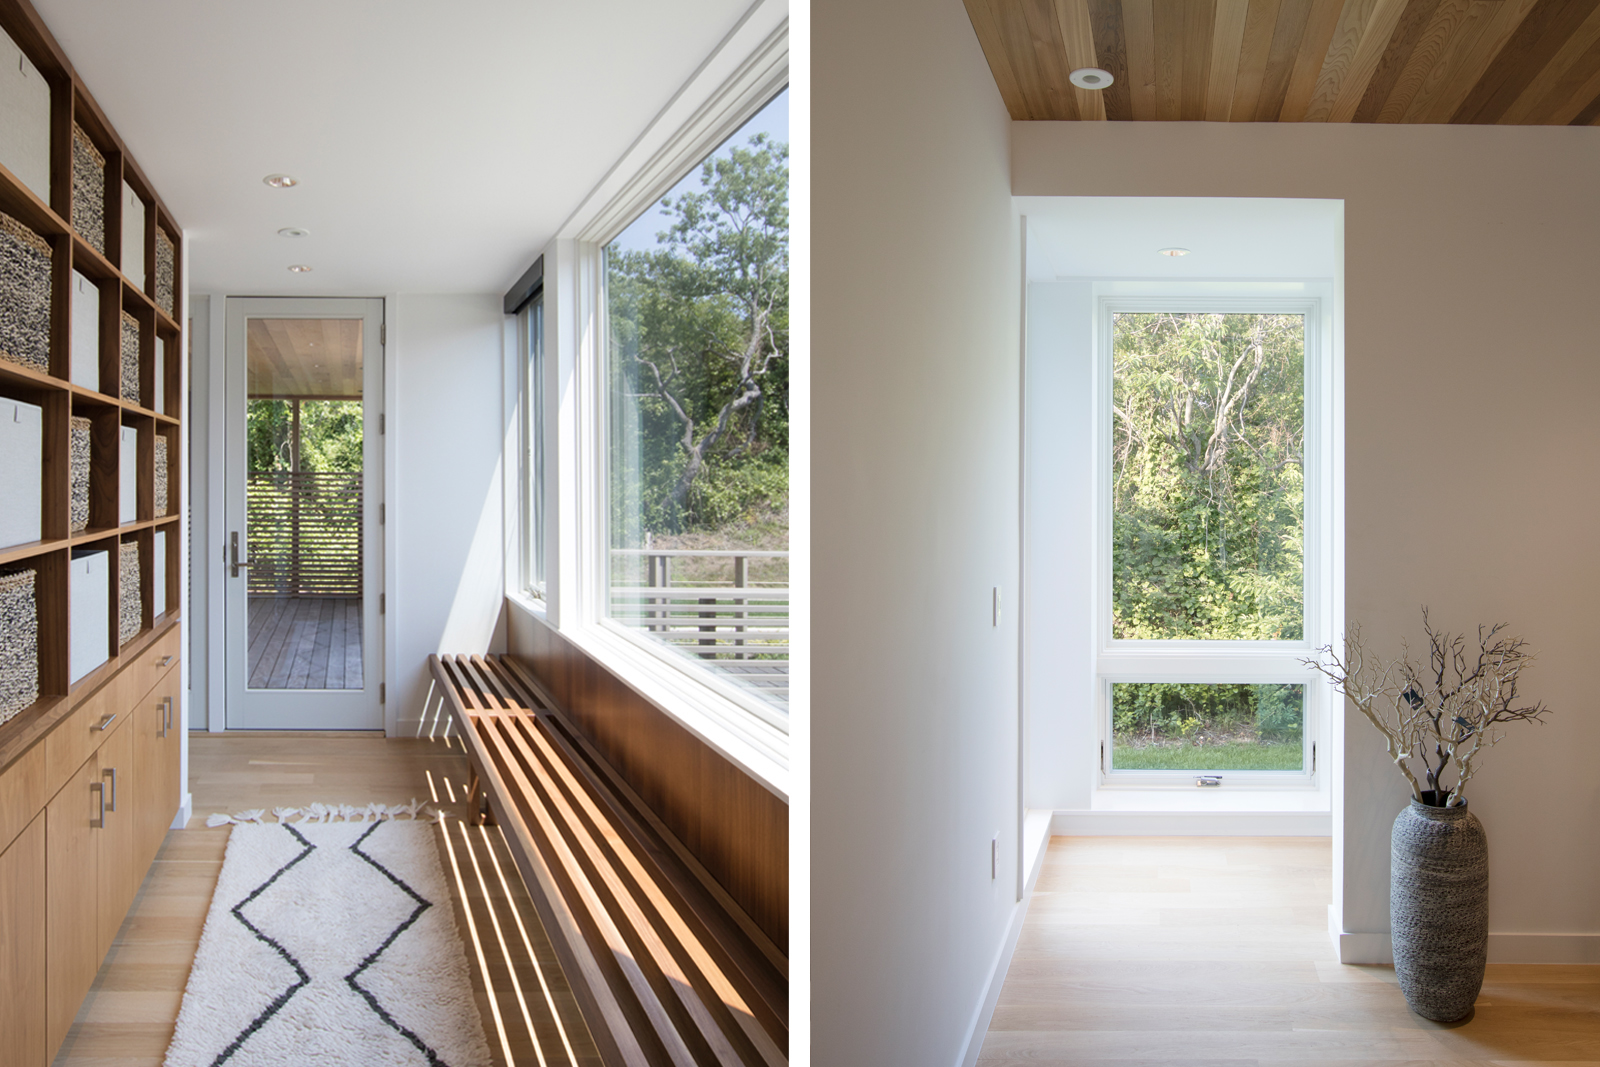 14-res4-resolution-4-architecture-modern-modular-house-prefab-home-north-fork-bluff-house-interior-entry-hallway-millwork-2.jpg